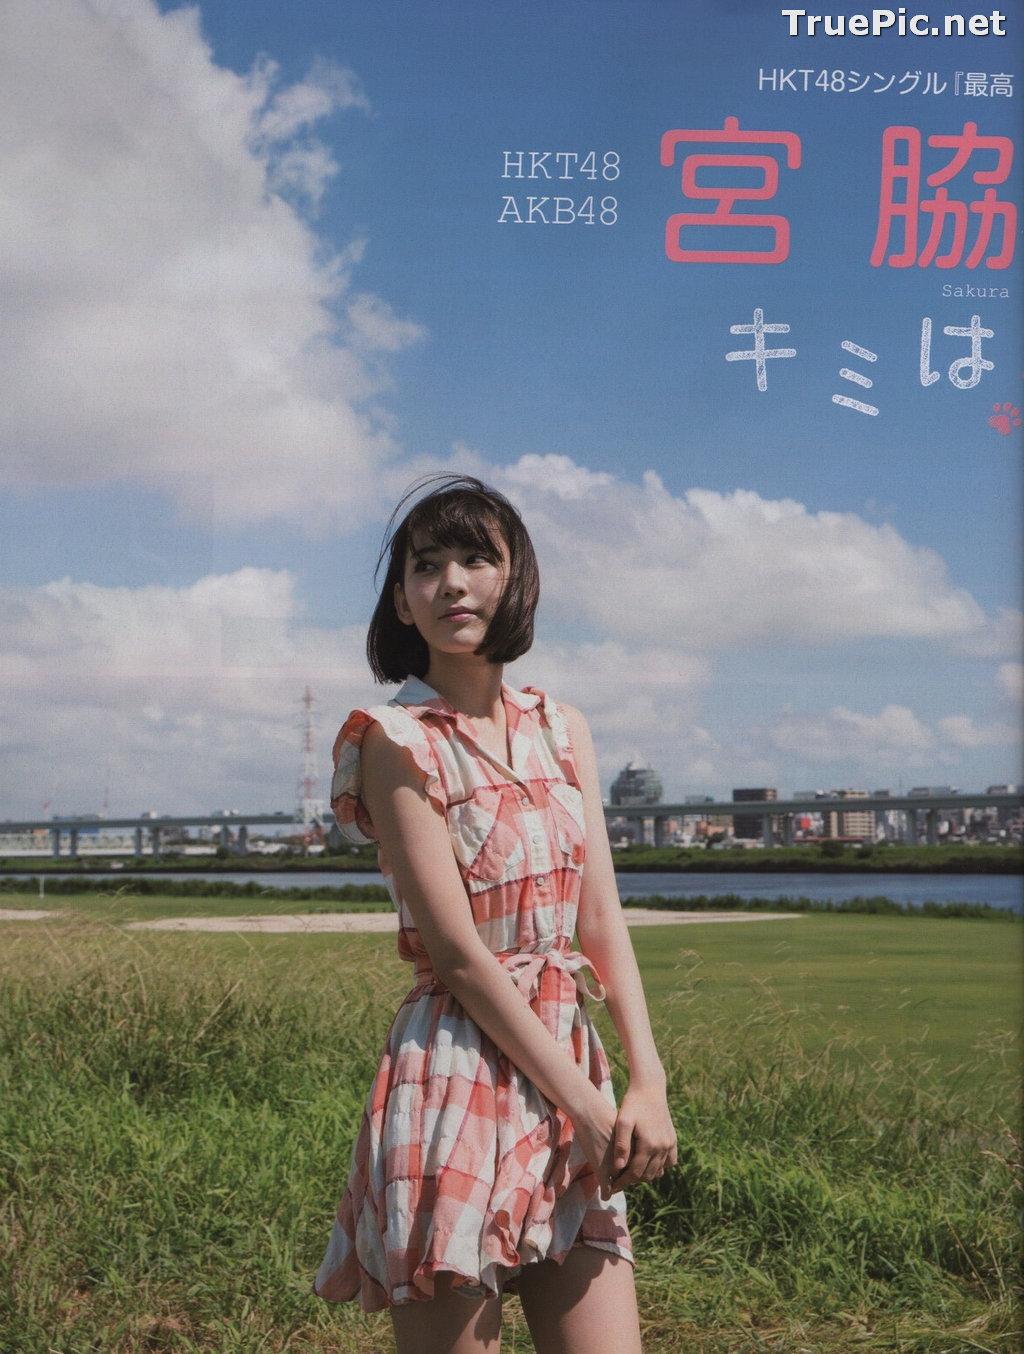 Image Japanese Singer and Actress - Sakura Miyawaki (宮脇咲良) - Sexy Picture Collection 2021 - TruePic.net - Picture-7